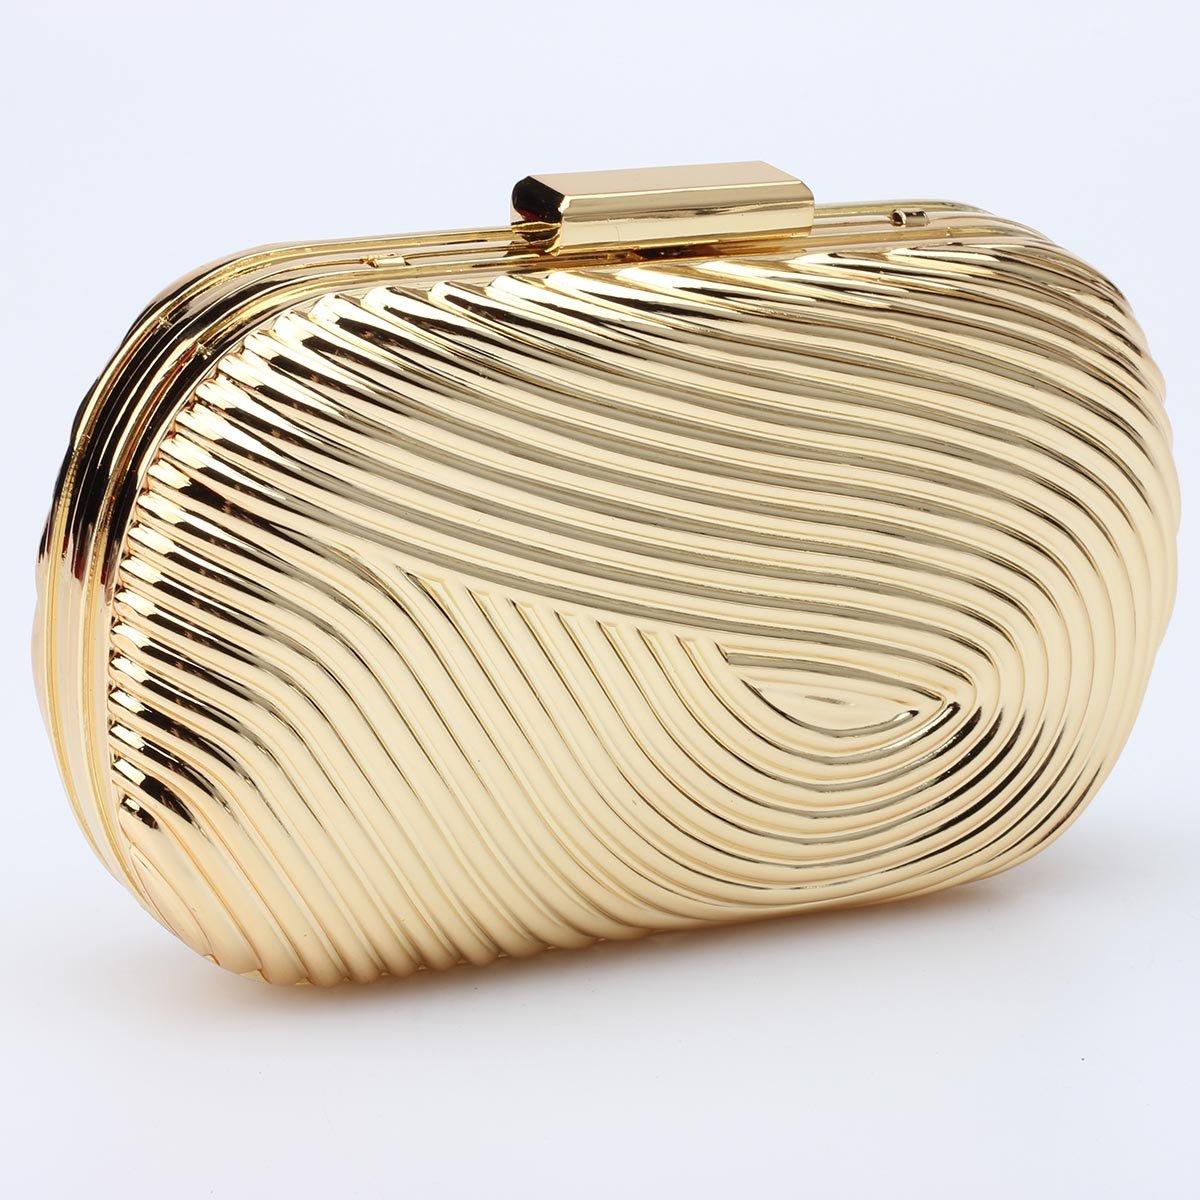 Mogor Womens Hard Case Alloy Chain Strap Fashion Handbag Clutch Gold